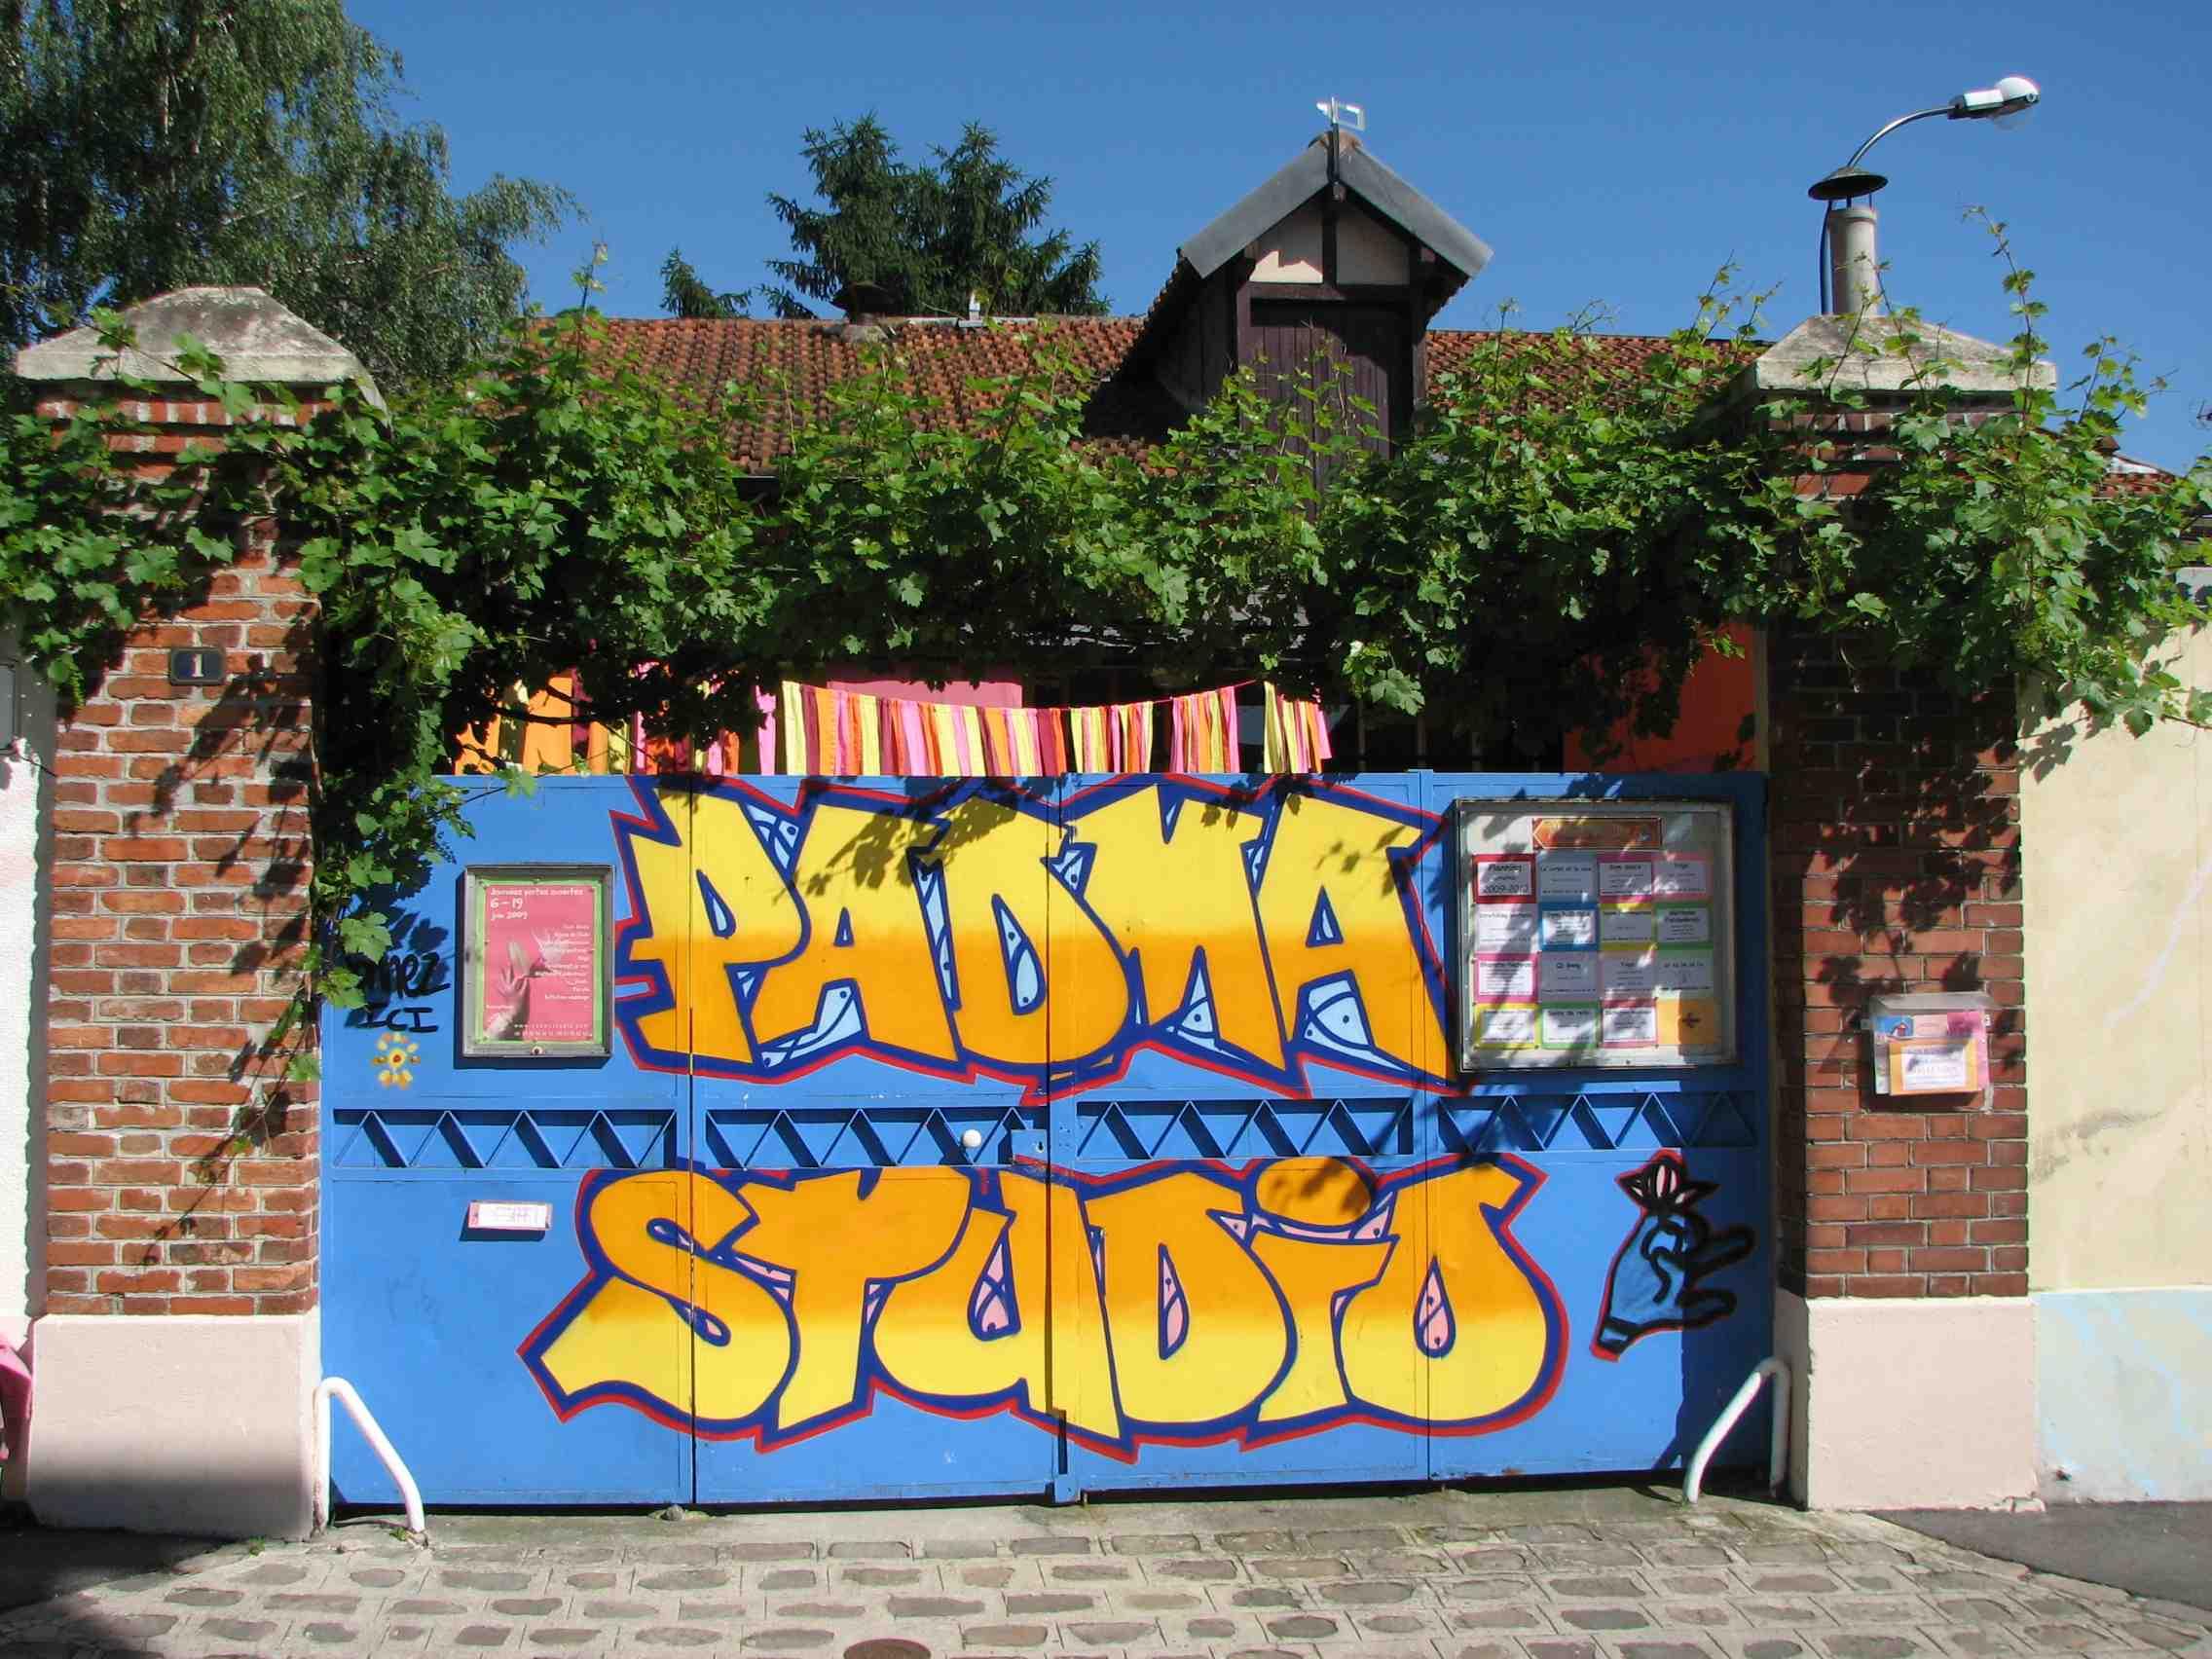 padma-studio-formation.jpg